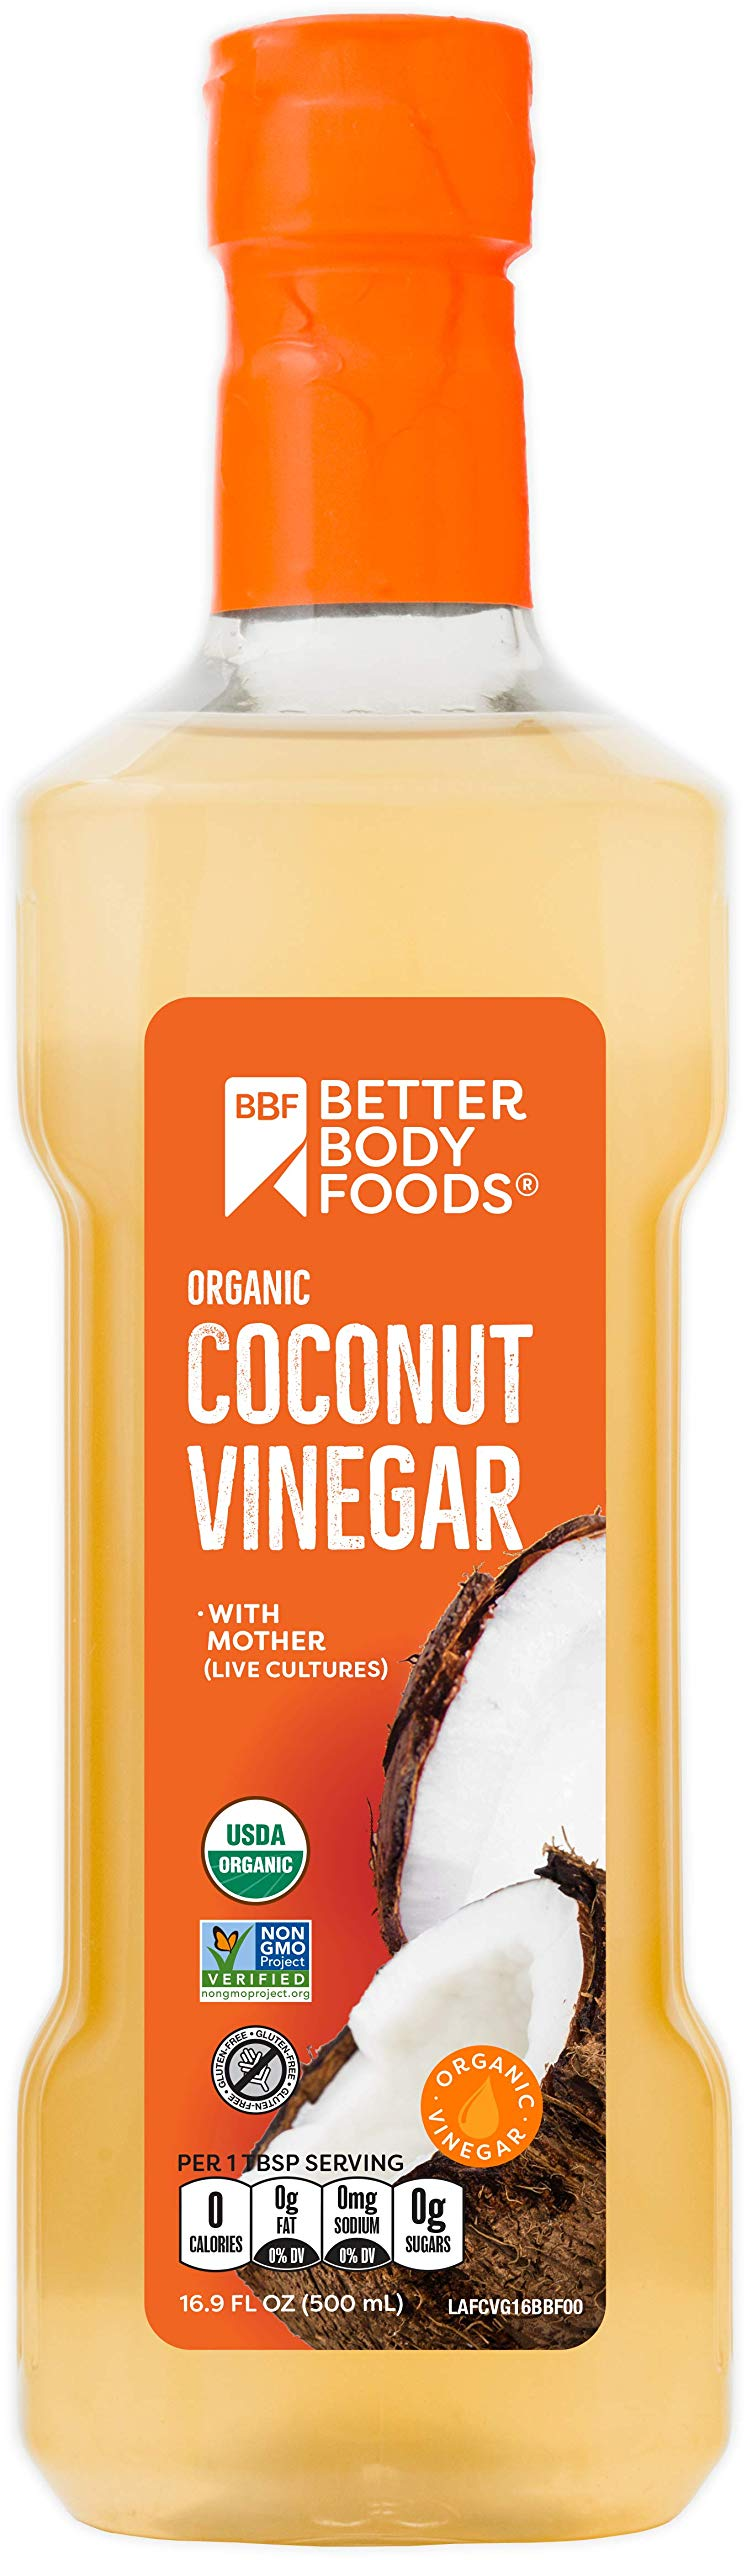 BetterBody Foods Organic Coconut Vinegar, 16.9 Ounces